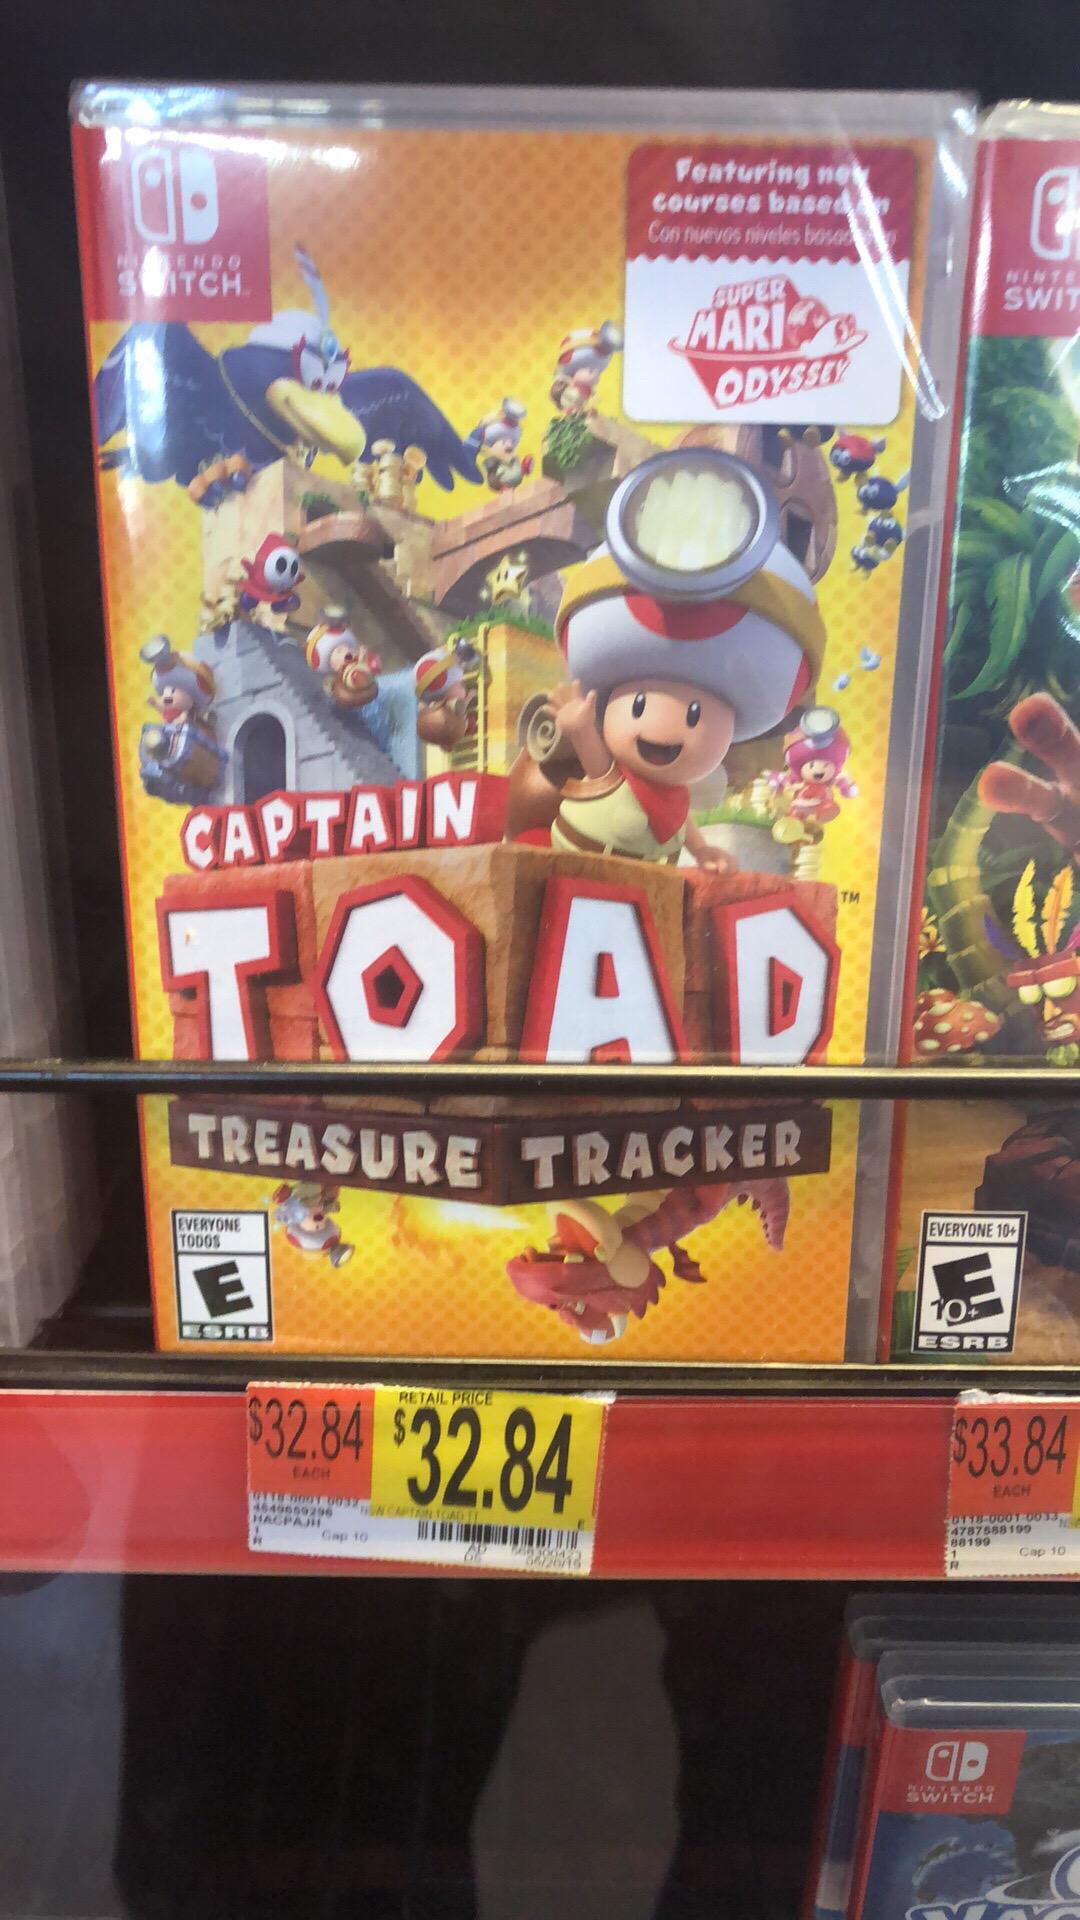 Captain Toad Nintendo Switch $32.84 Walmart